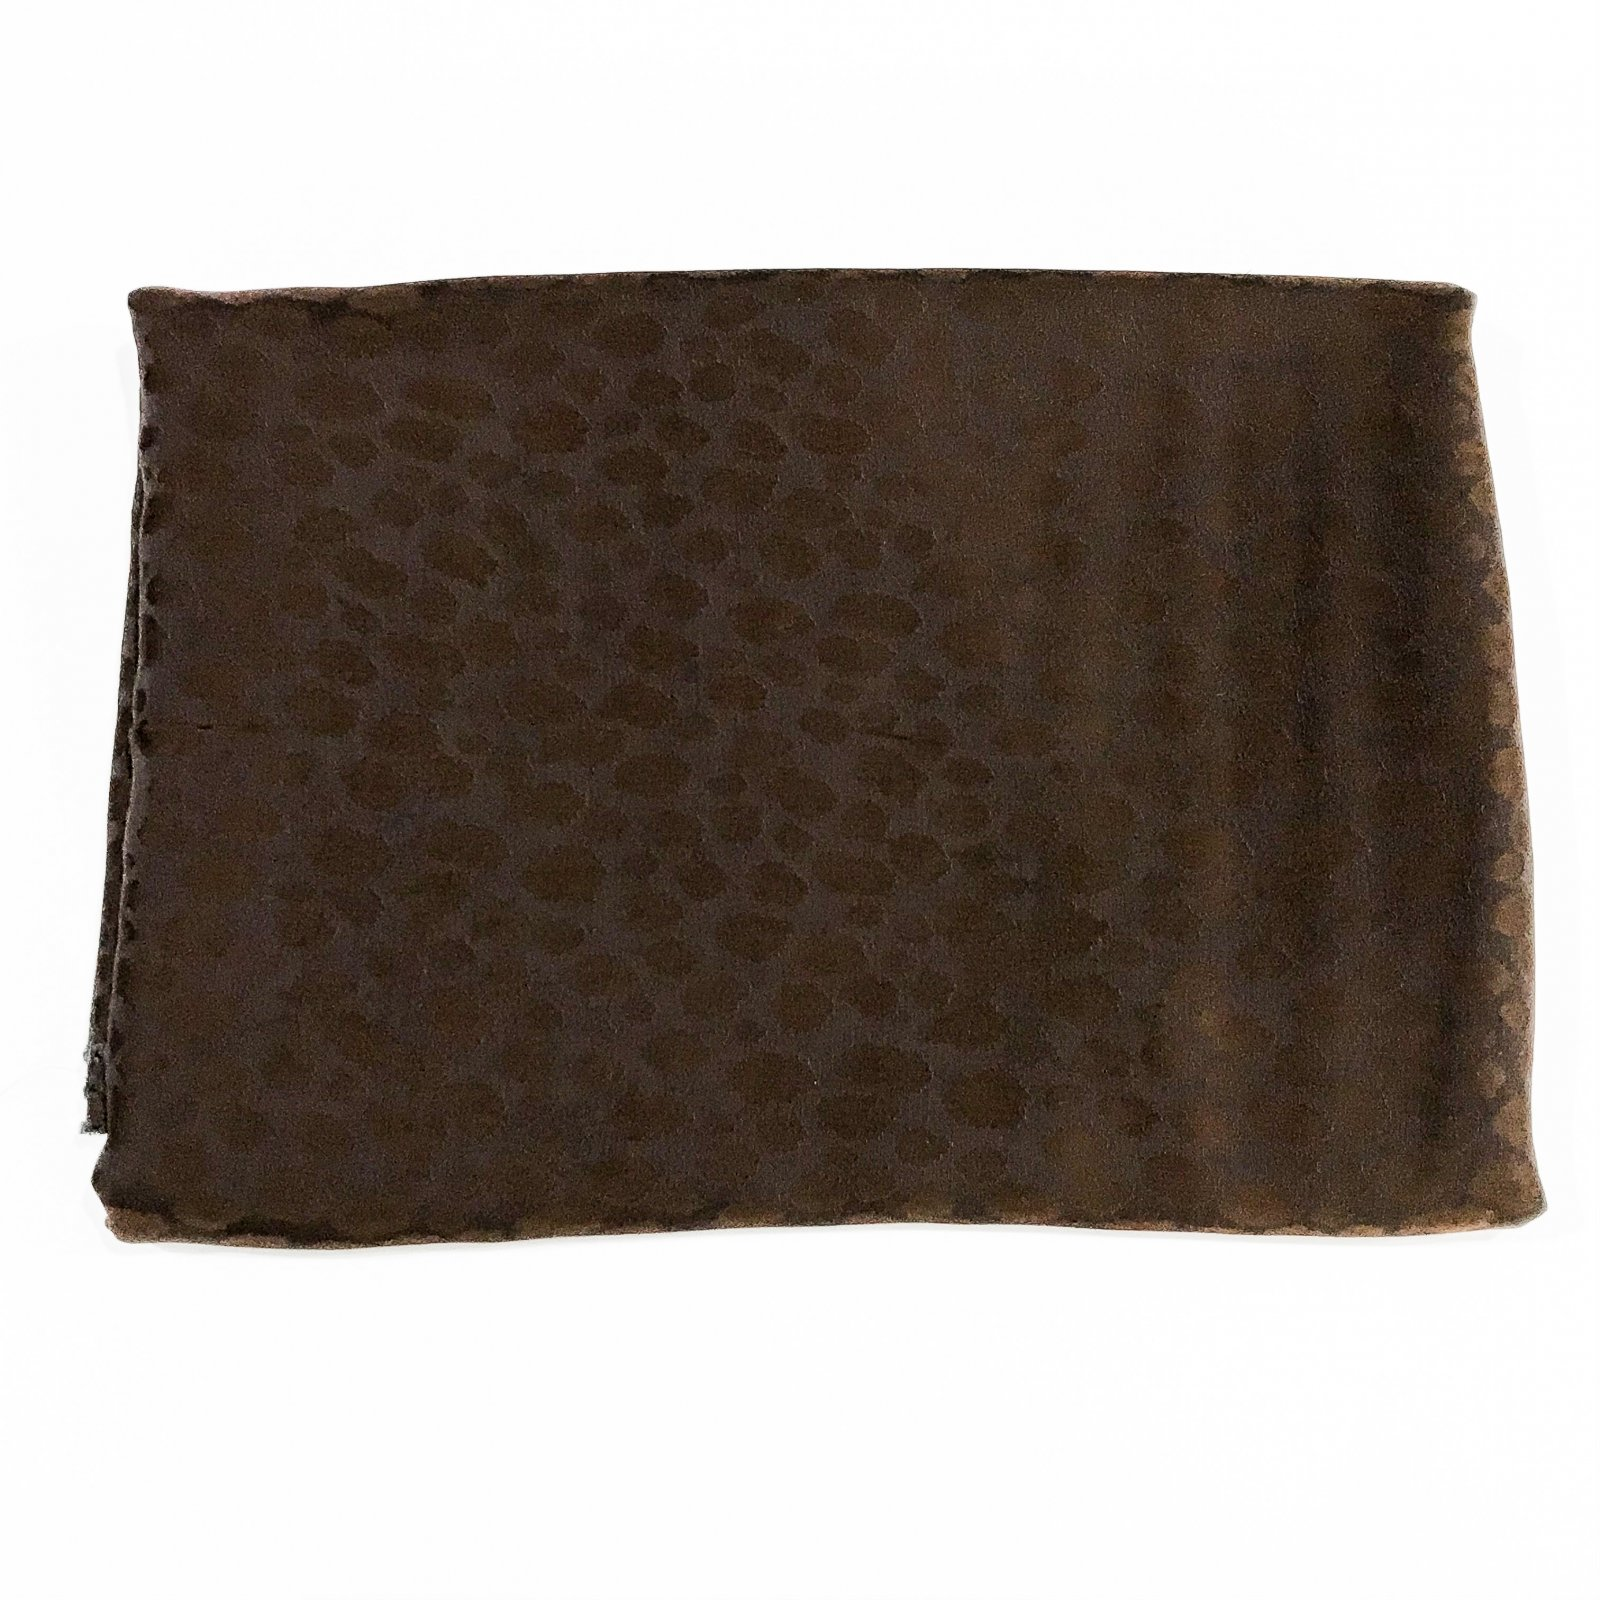 Viscose - Brown Animal Spots - 2 7/8 yards